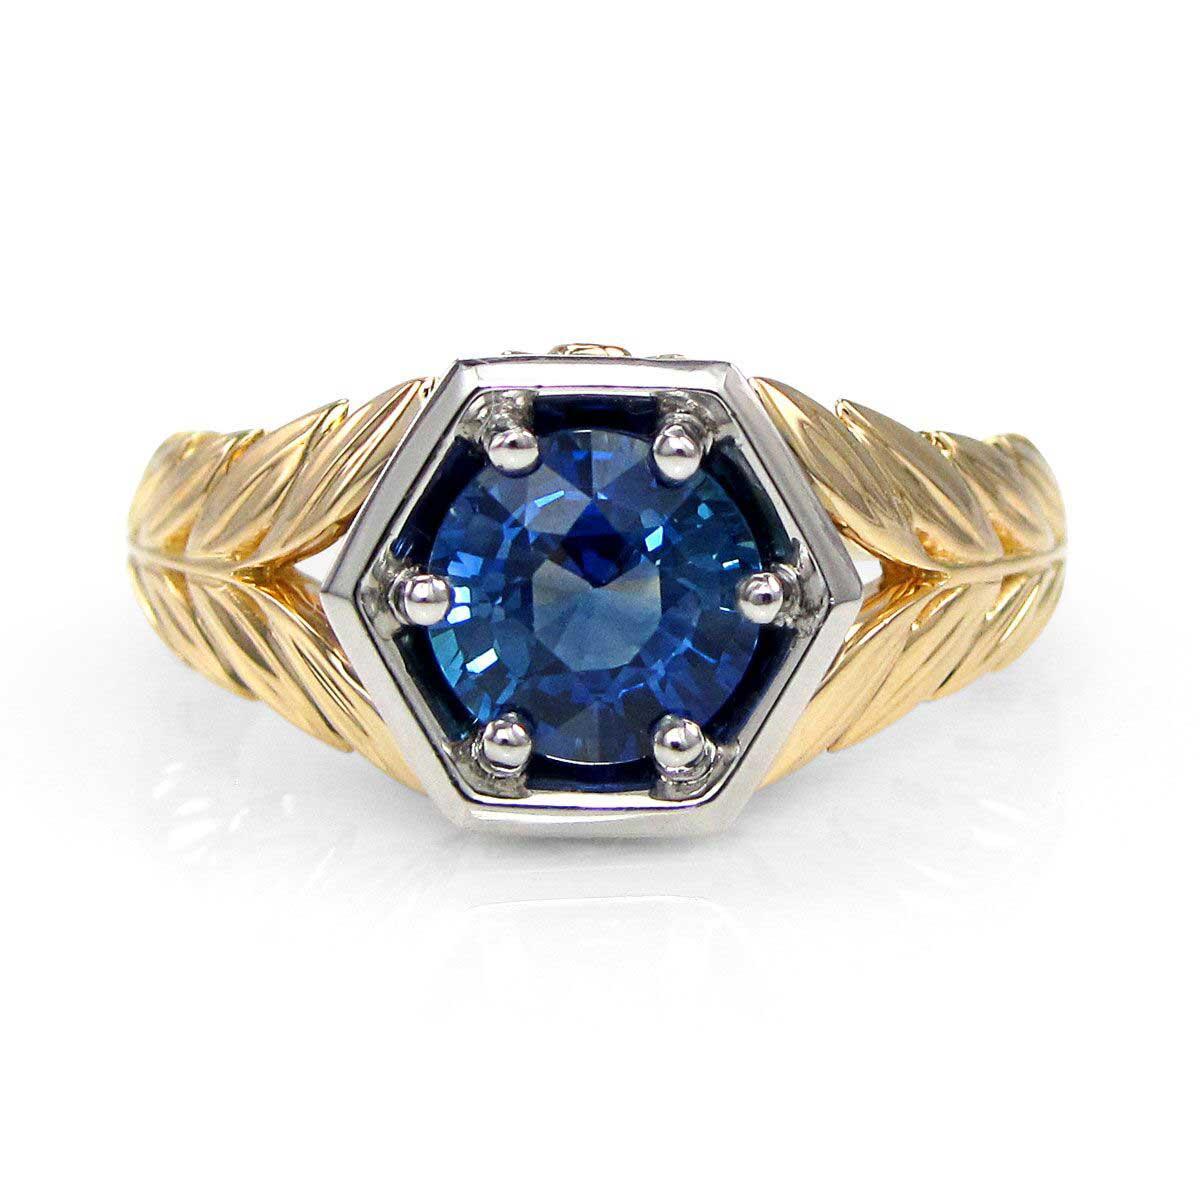 Vintage Sapphire Engagement Ring